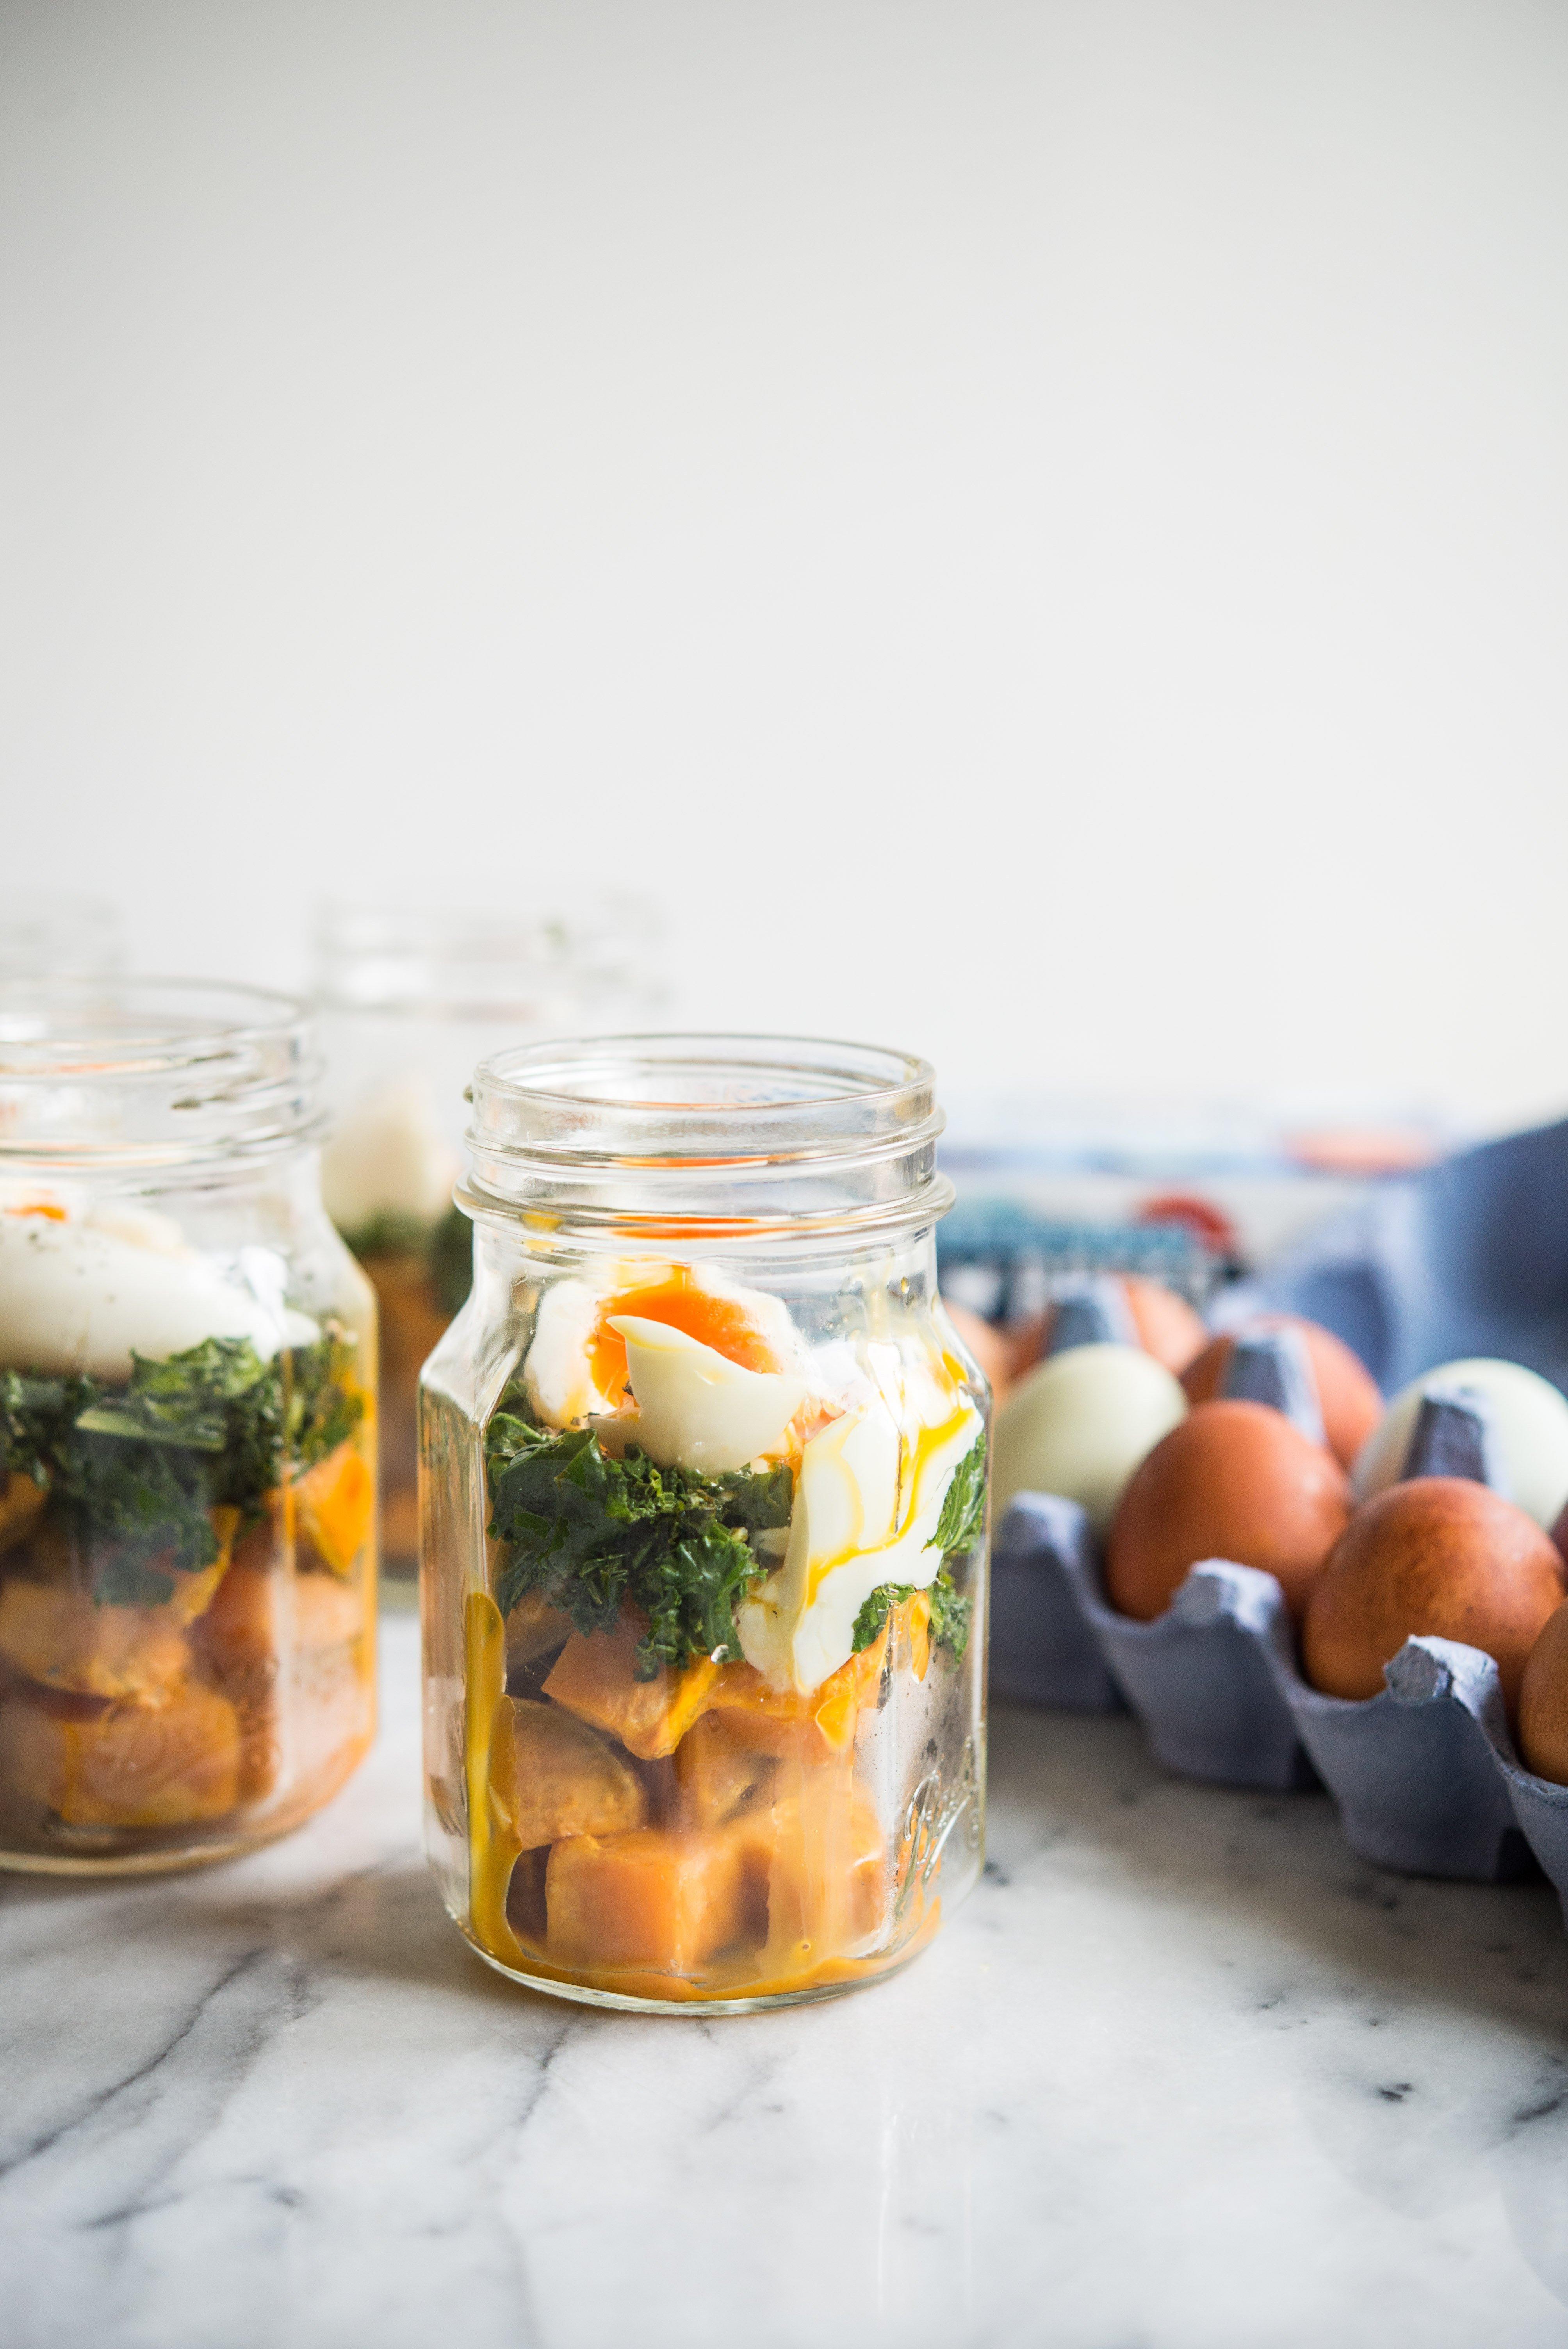 make-ahead balanced breakfast jars - sweet potatoes, kale, and soft boiled eggs in a mason jar on a marble board